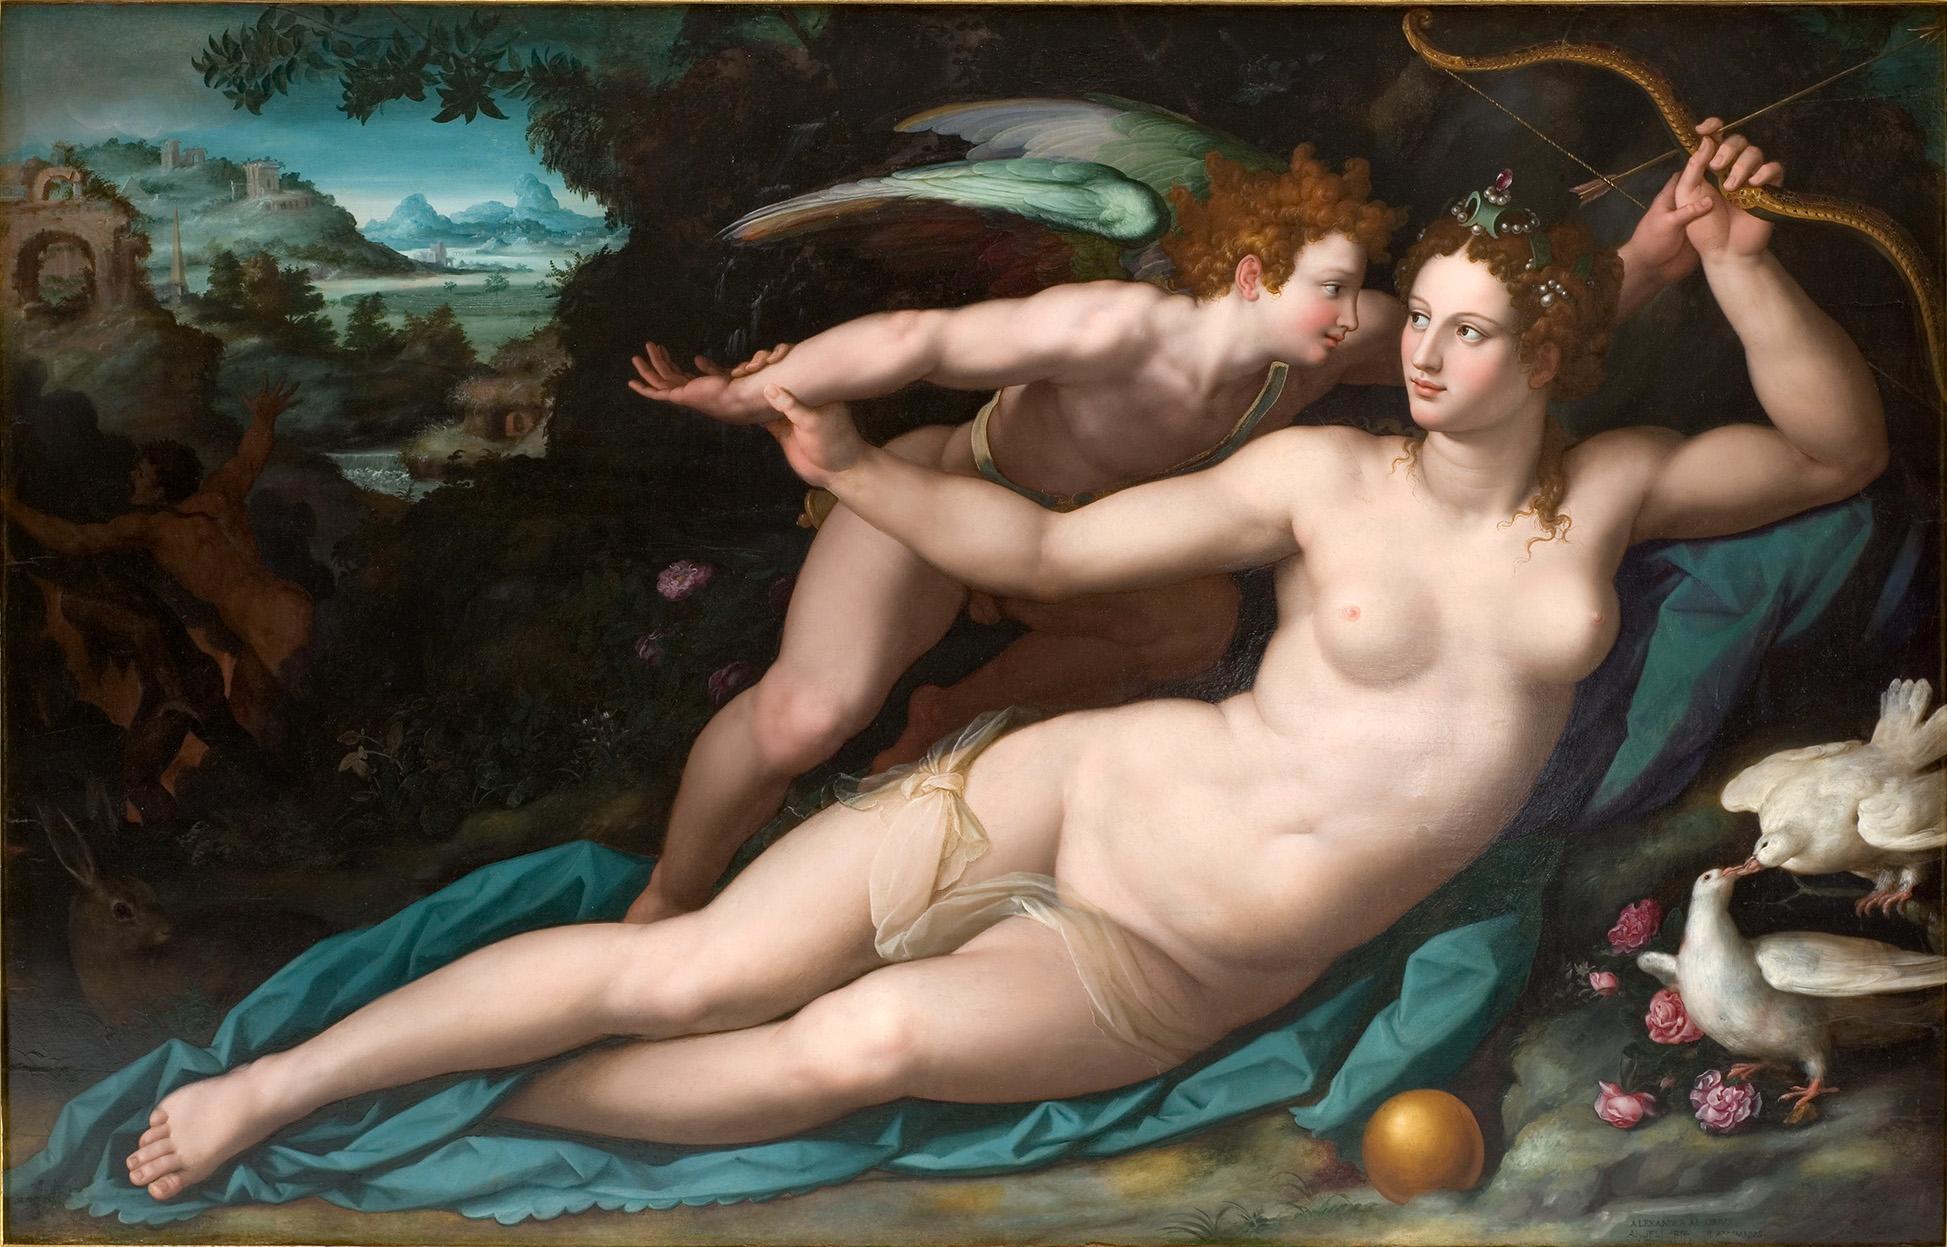 Alessandro Allori, 1535-1607. Венера и Купидон. ок.1570. Монпелье, Музей Фабре